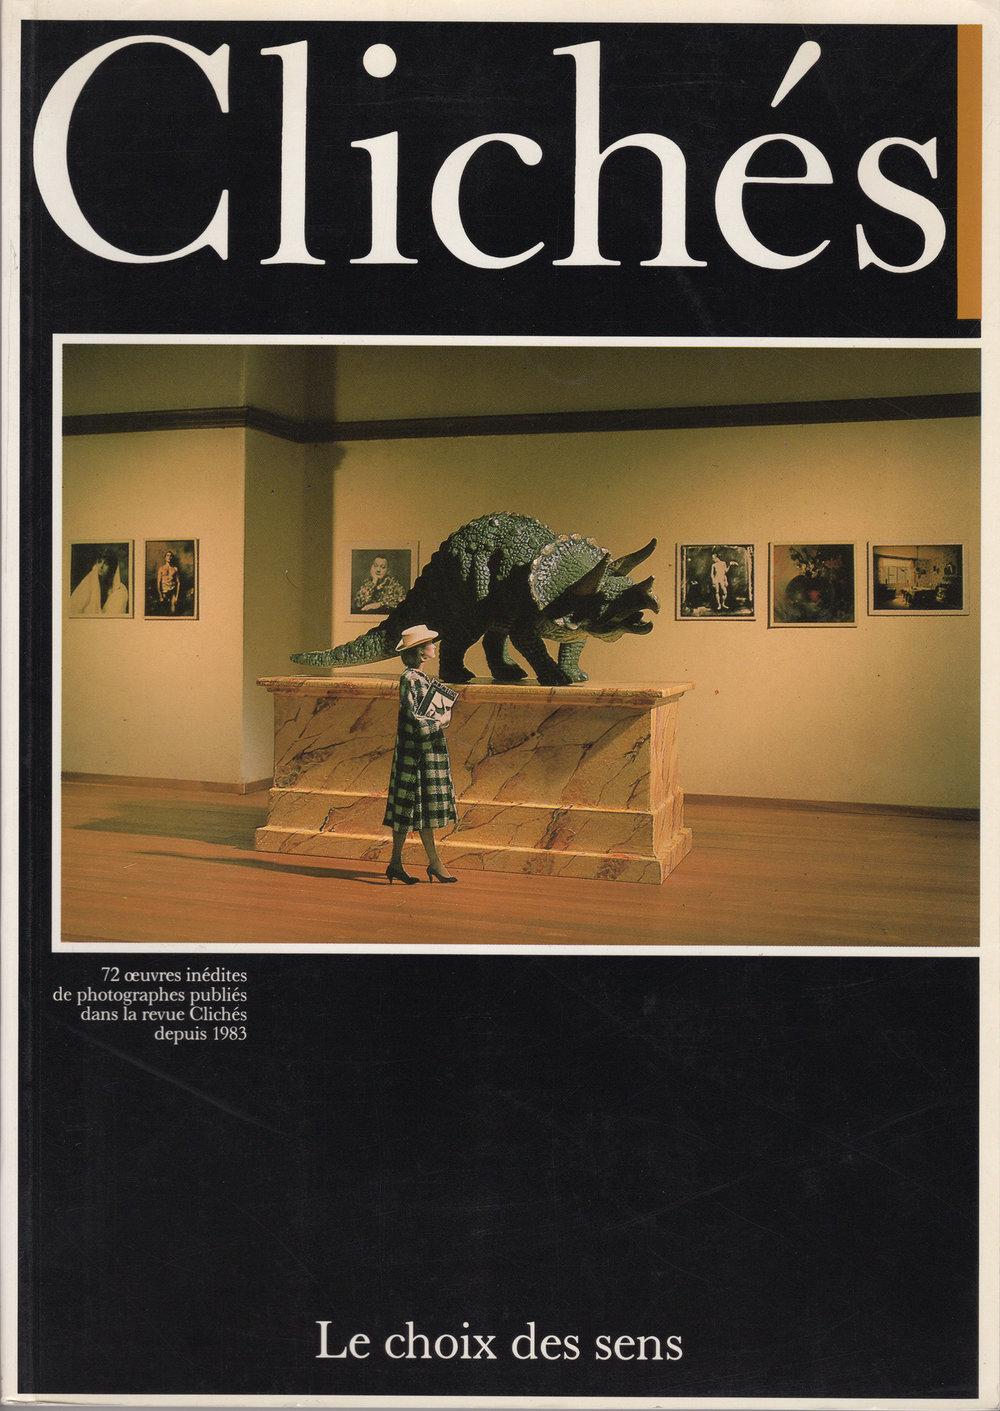 Clichés (USSR)